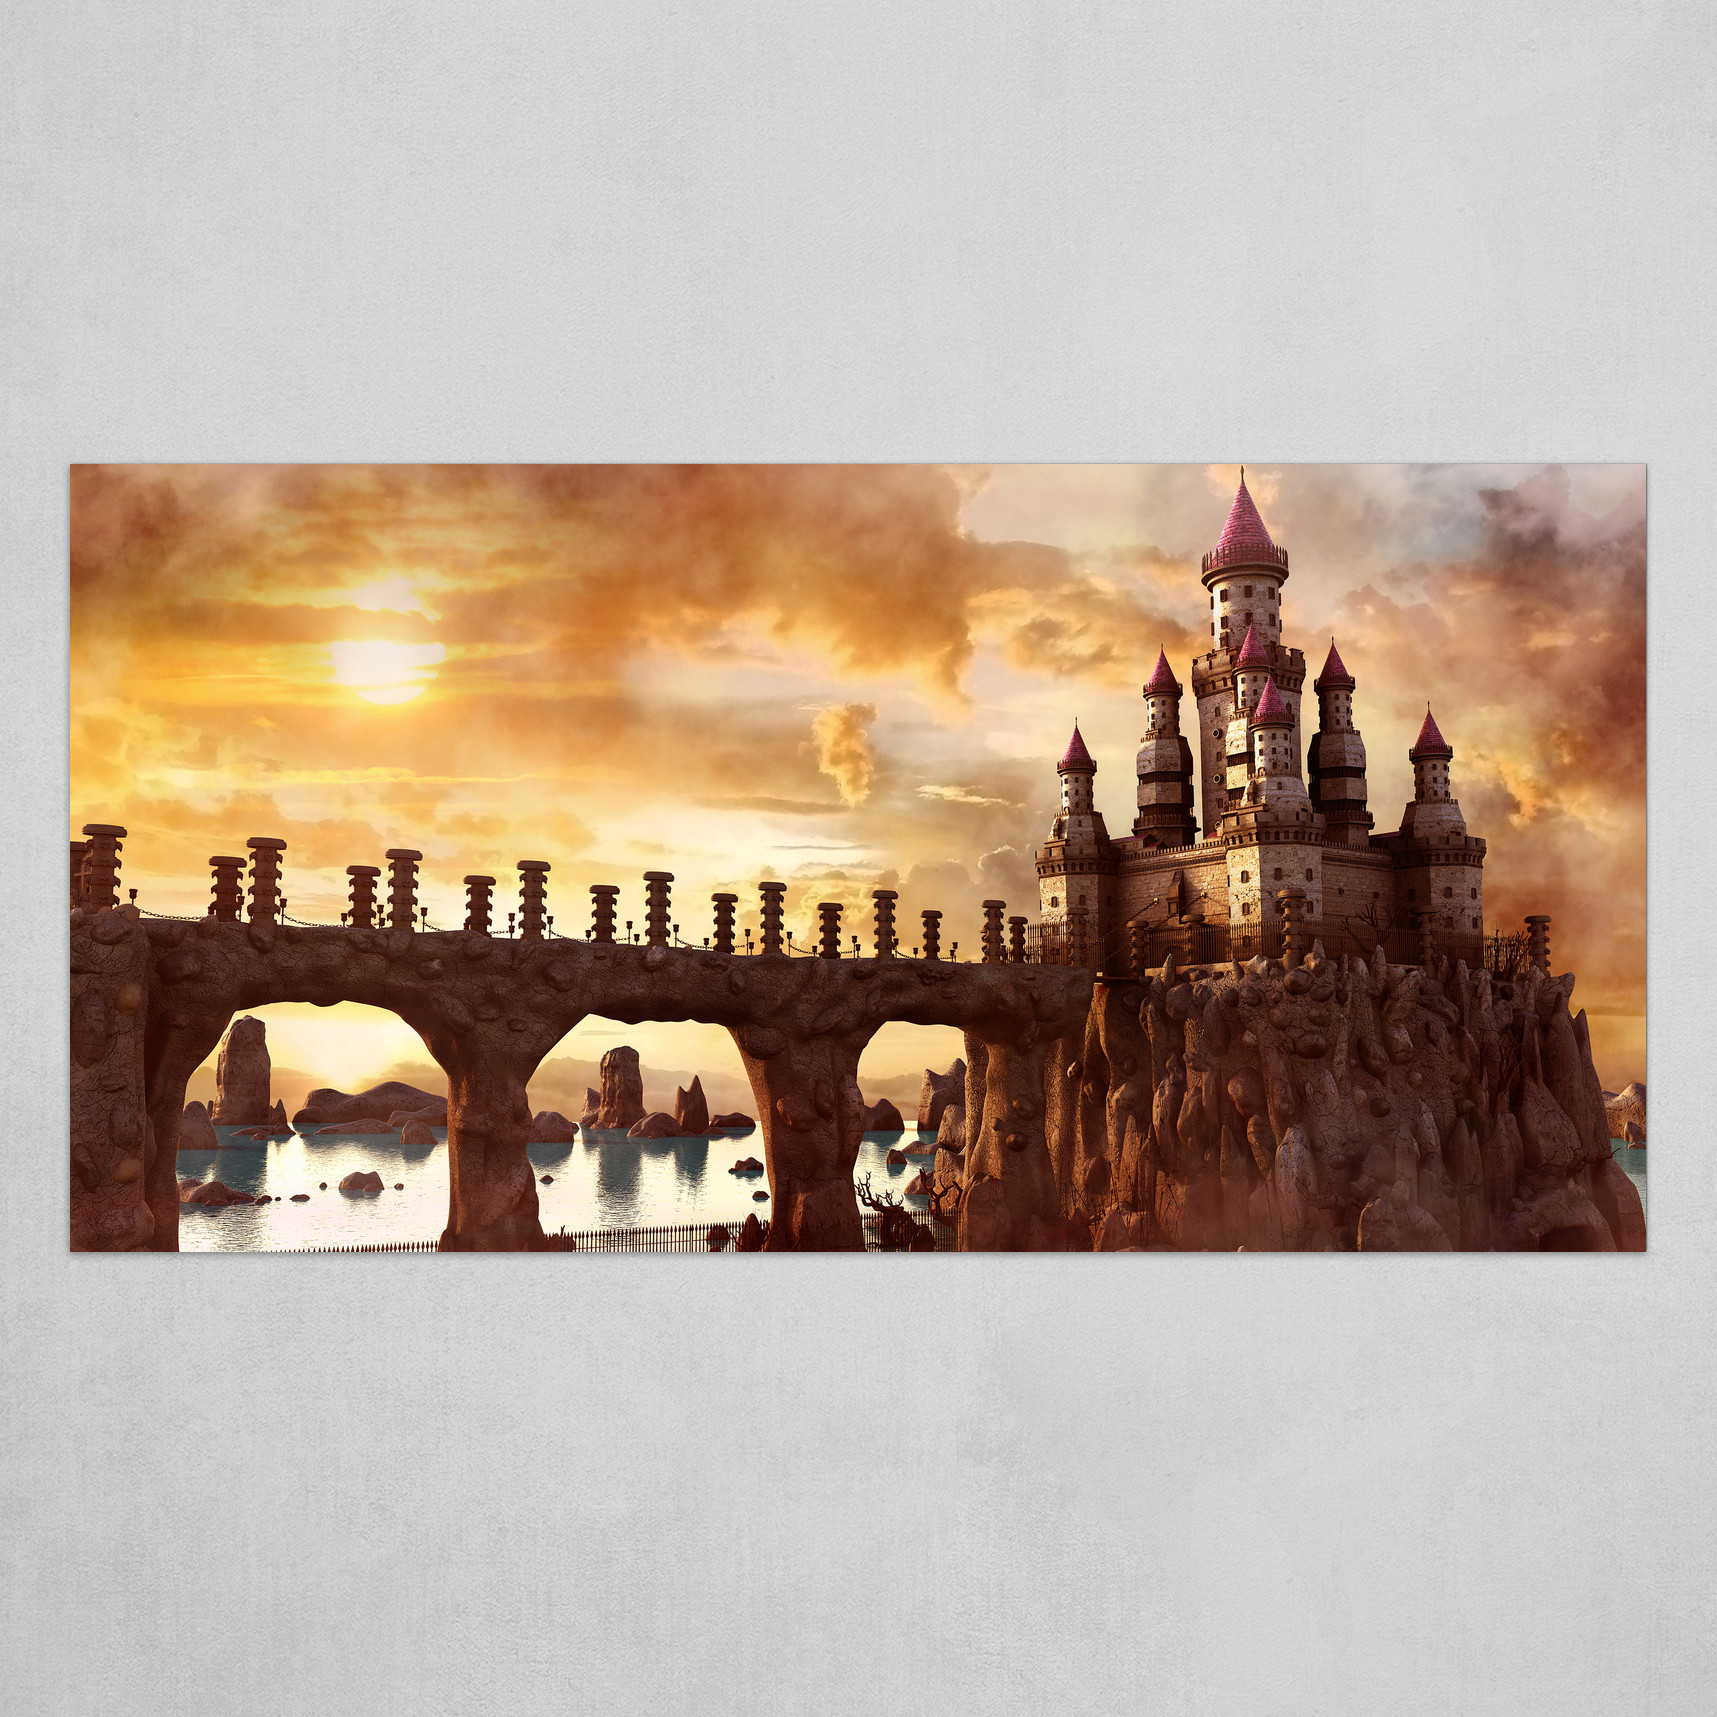 Fantasy Castle V2